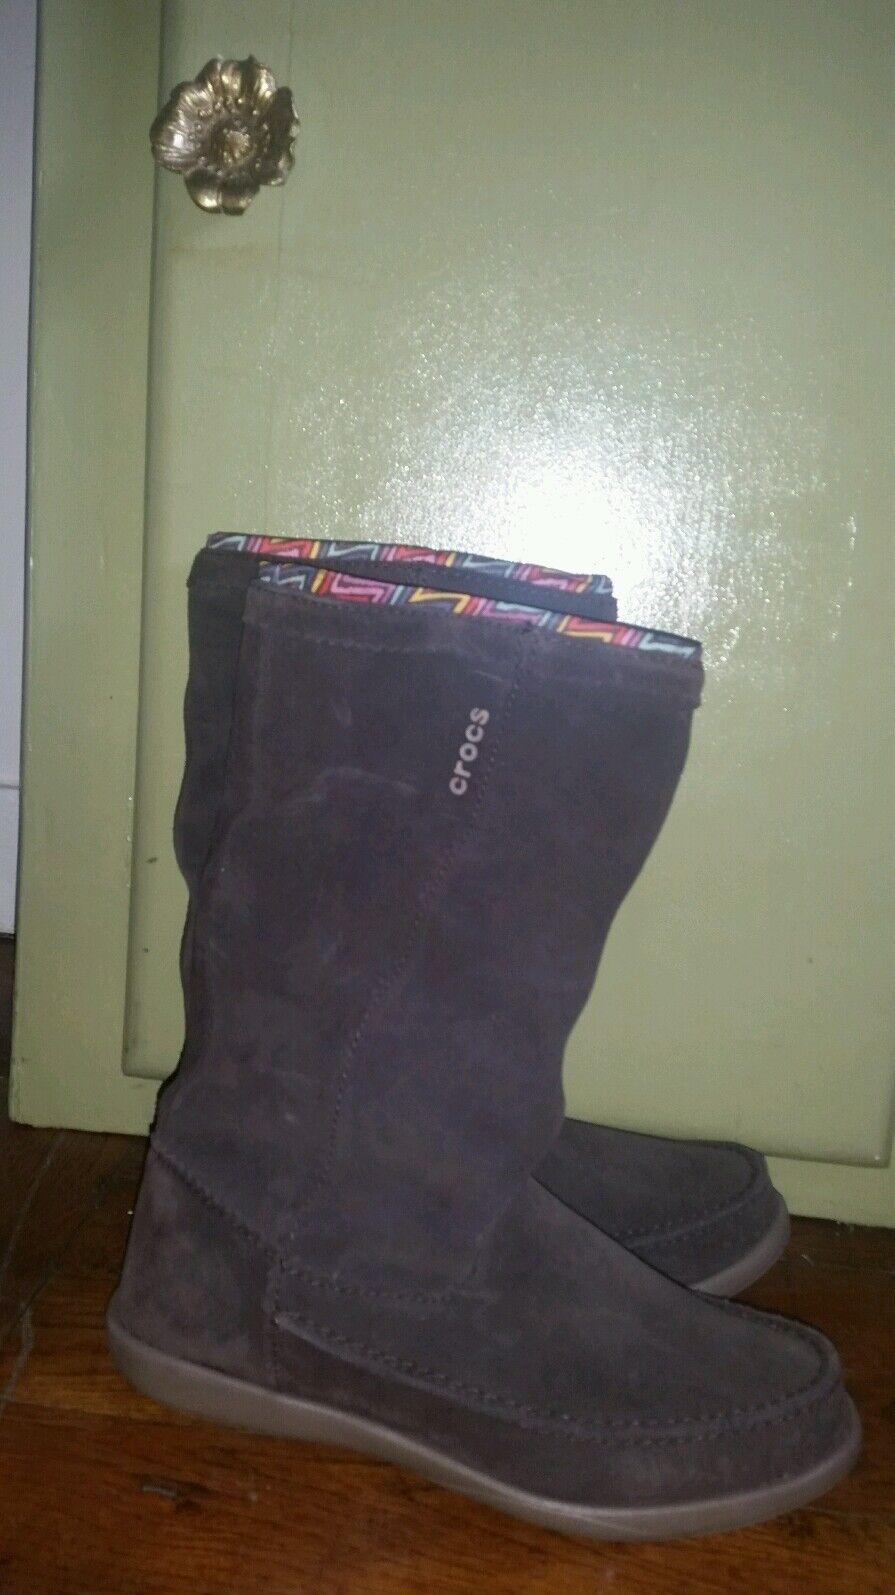 Bottes CROCS P38 W6 mocassins confort NEUFS escarpins ballerines shoes